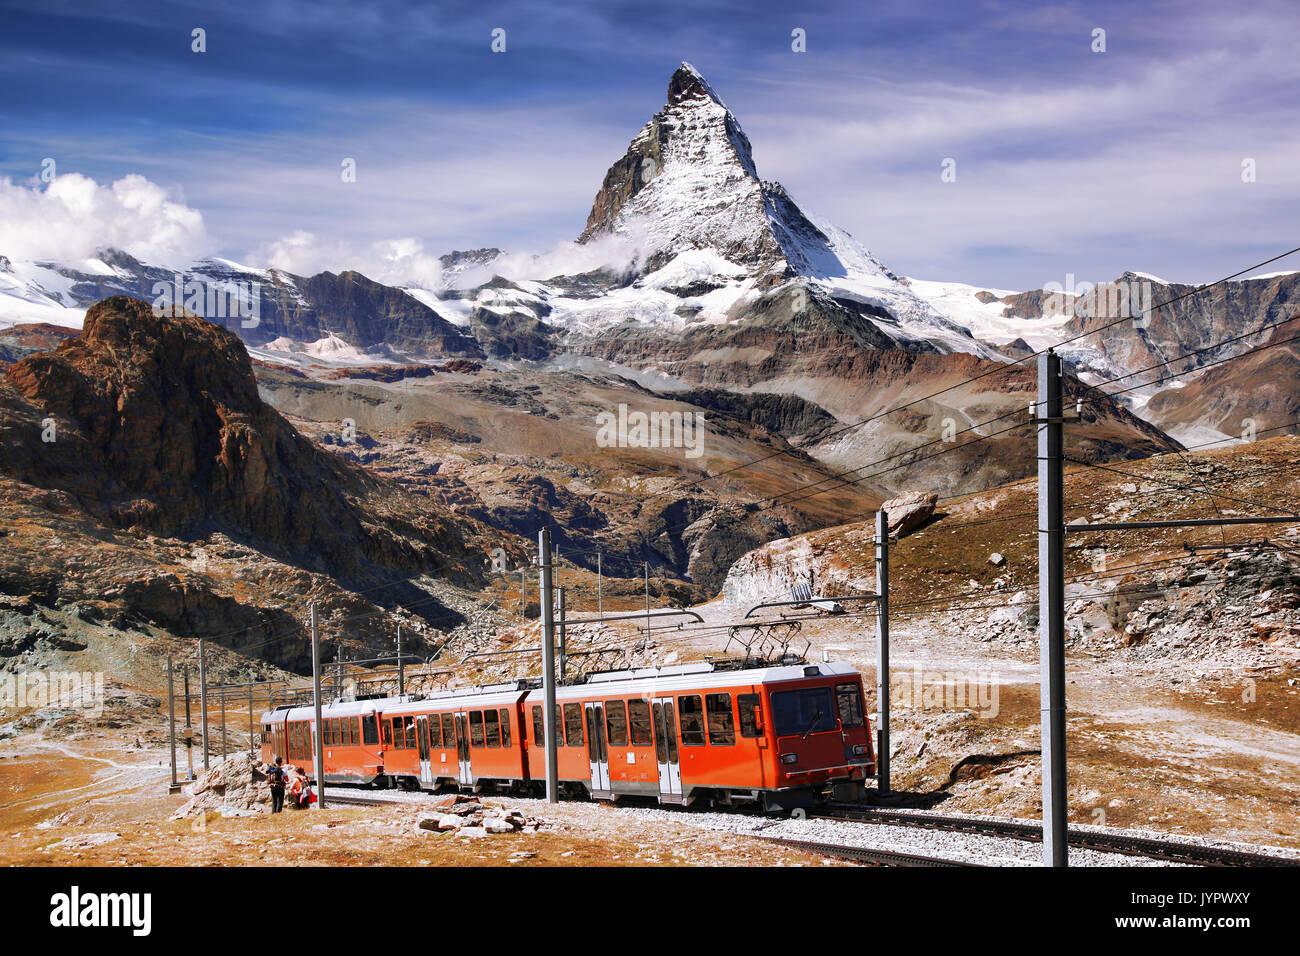 Famous Matterhorn peak with Gornergrat train in Swiss Alps, Switzerland - Stock Image